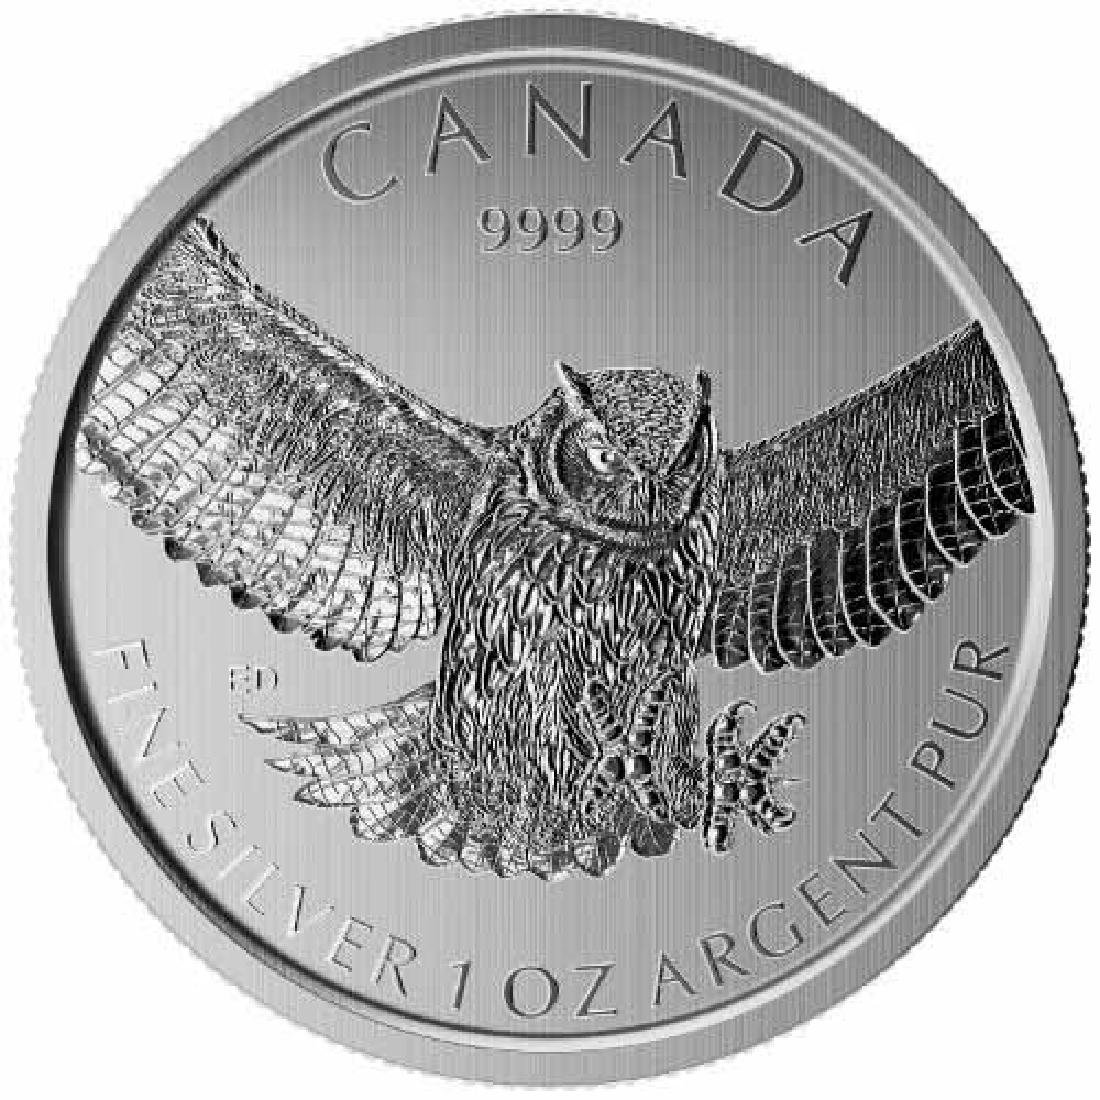 Canadian Silver 1 oz Great Horned Owl 2015 (Birds of Pr